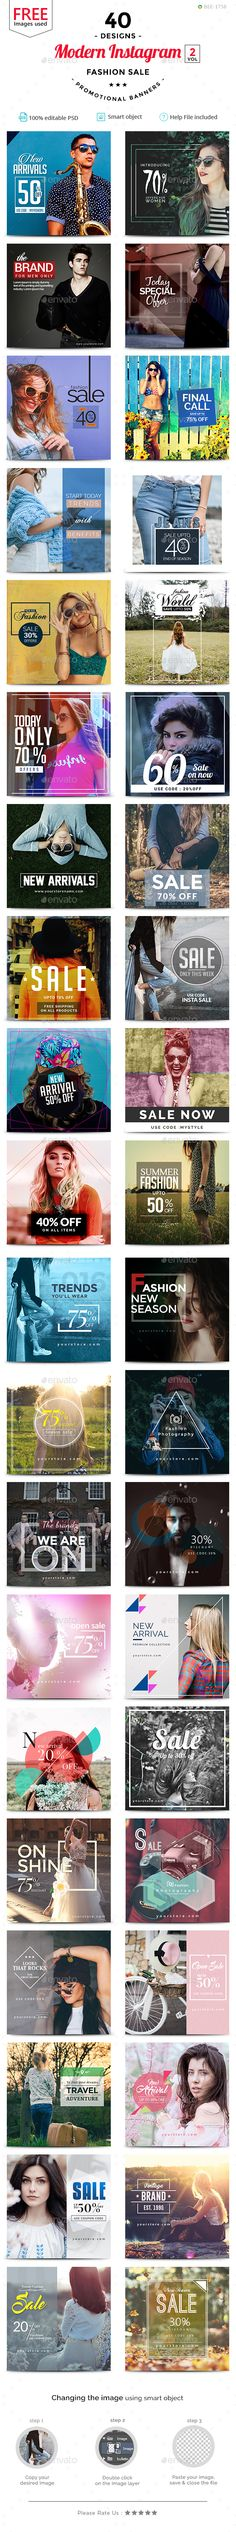 Fashion Sale Instagram Design(Vol-02)  - 40 Designs